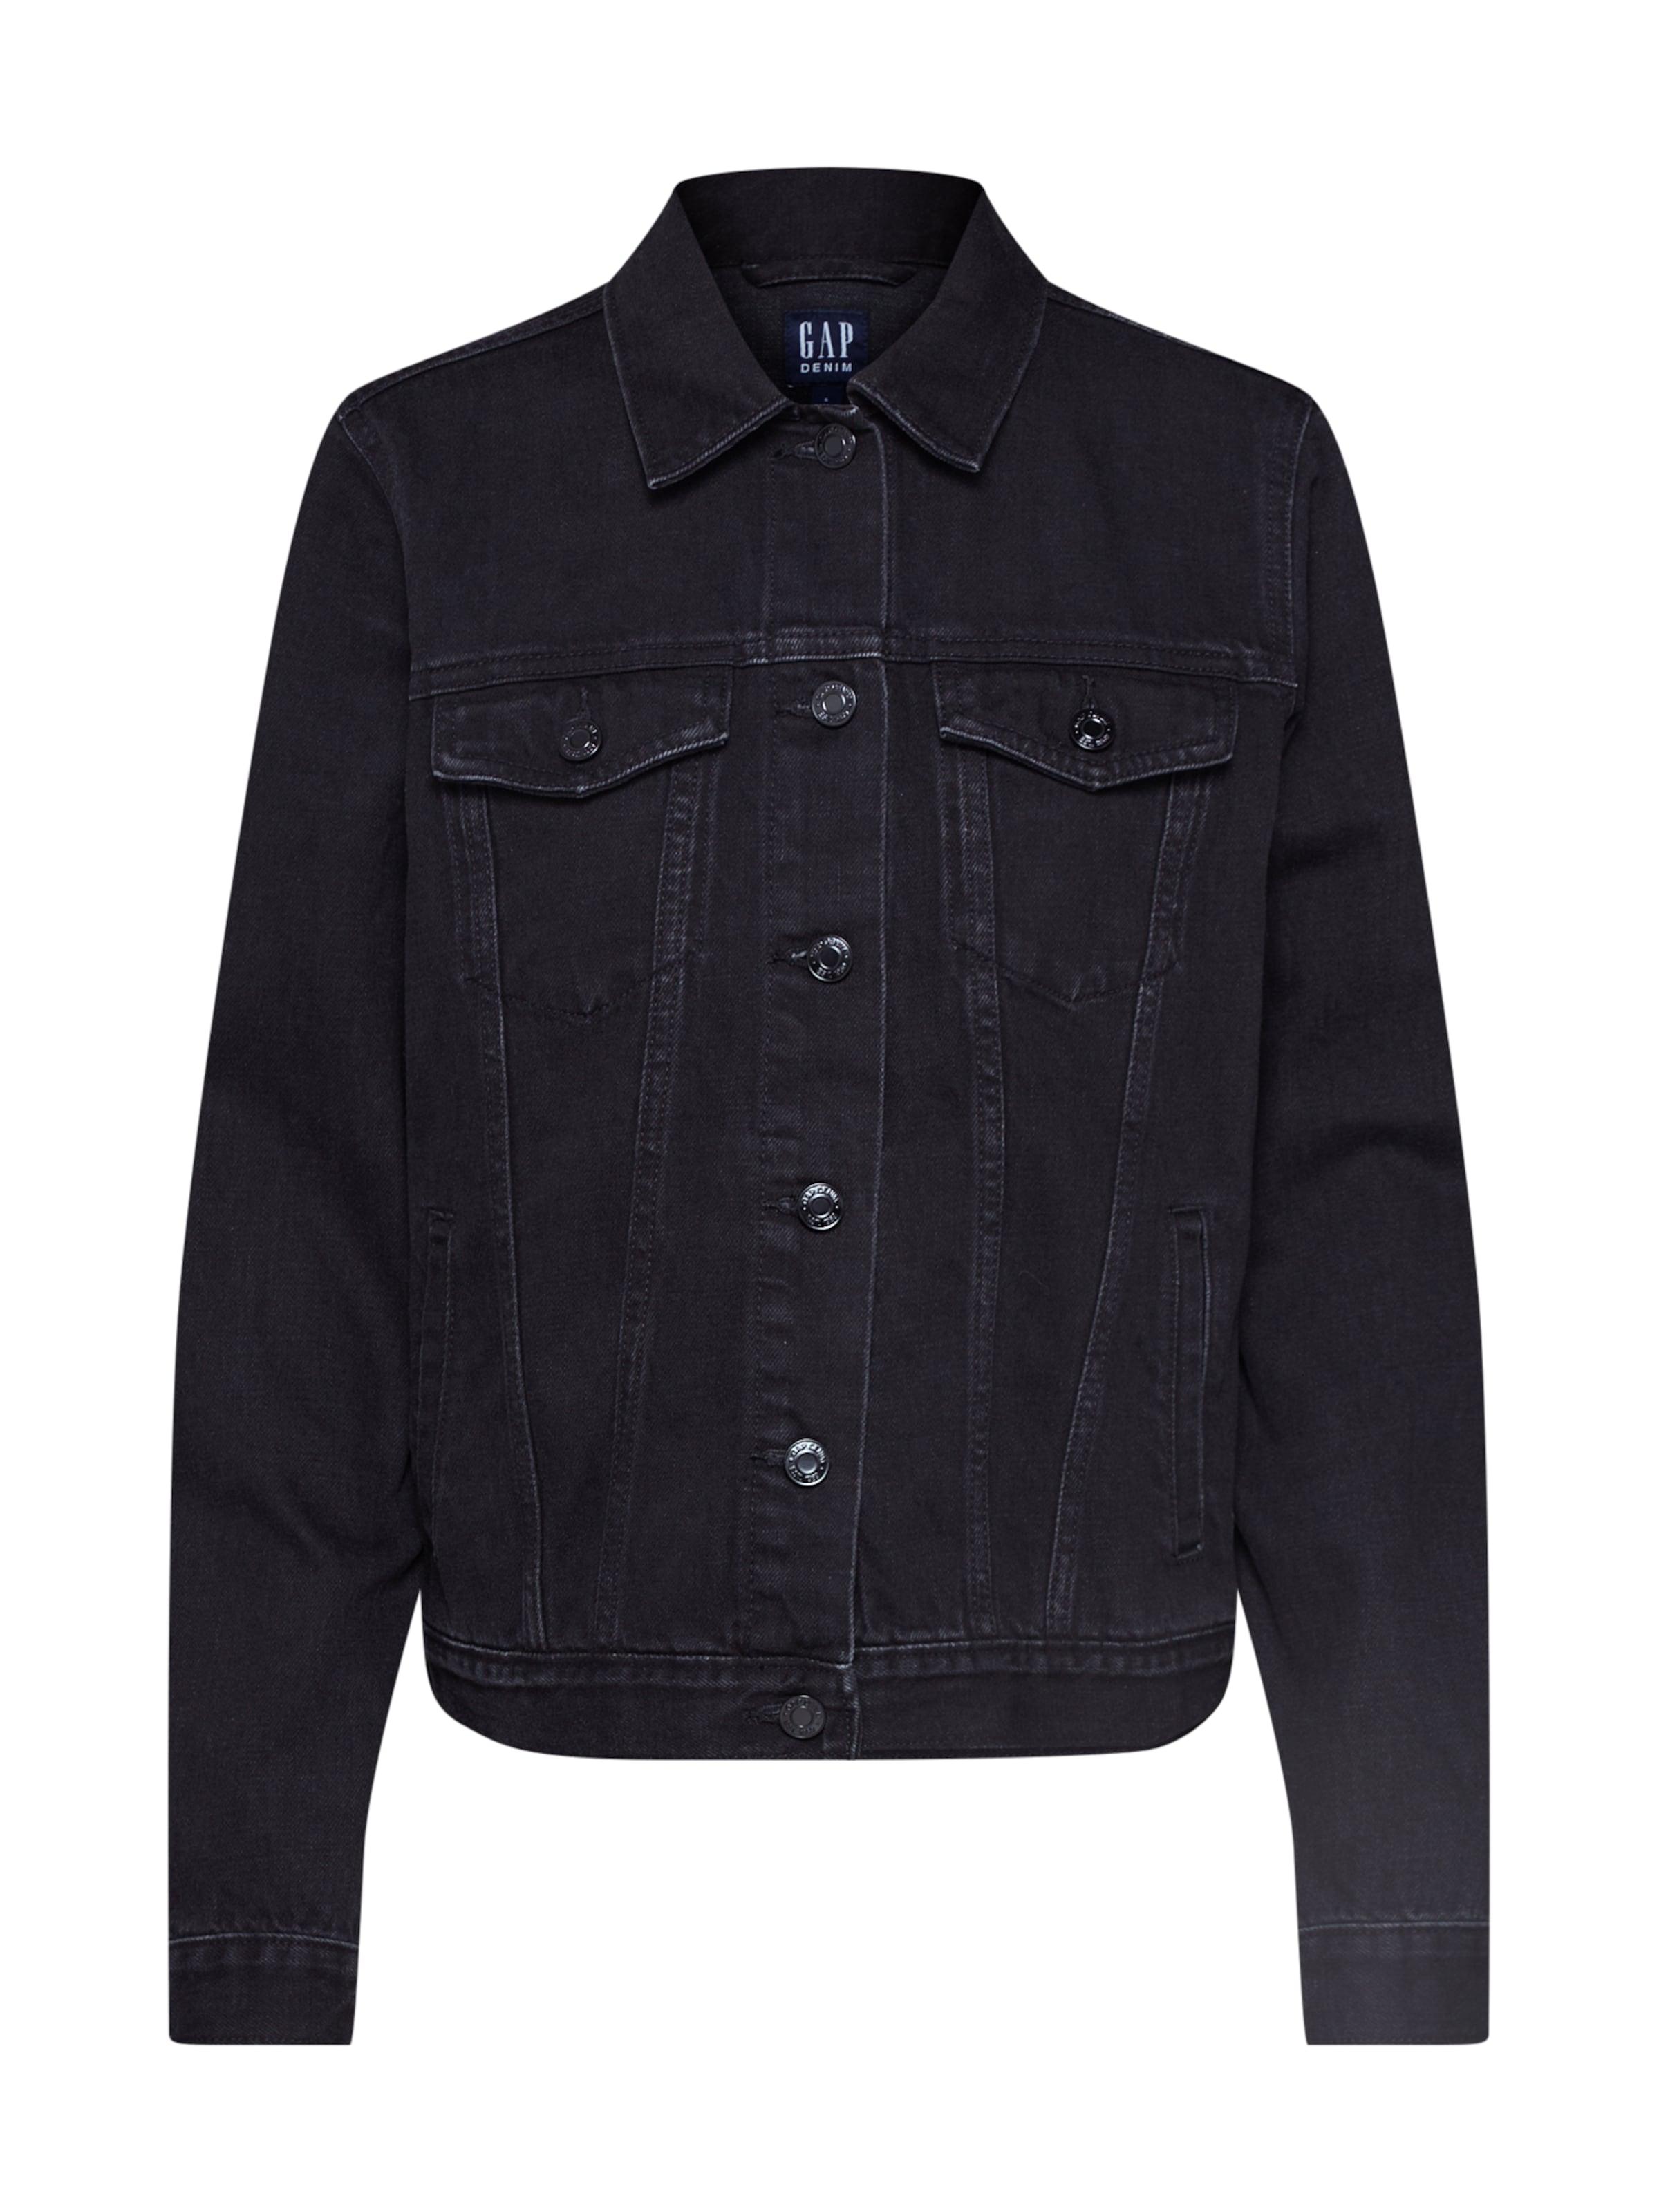 Gap Jeansjacke In Black 'icon JktWashed Denim Black' I29EDbWHeY